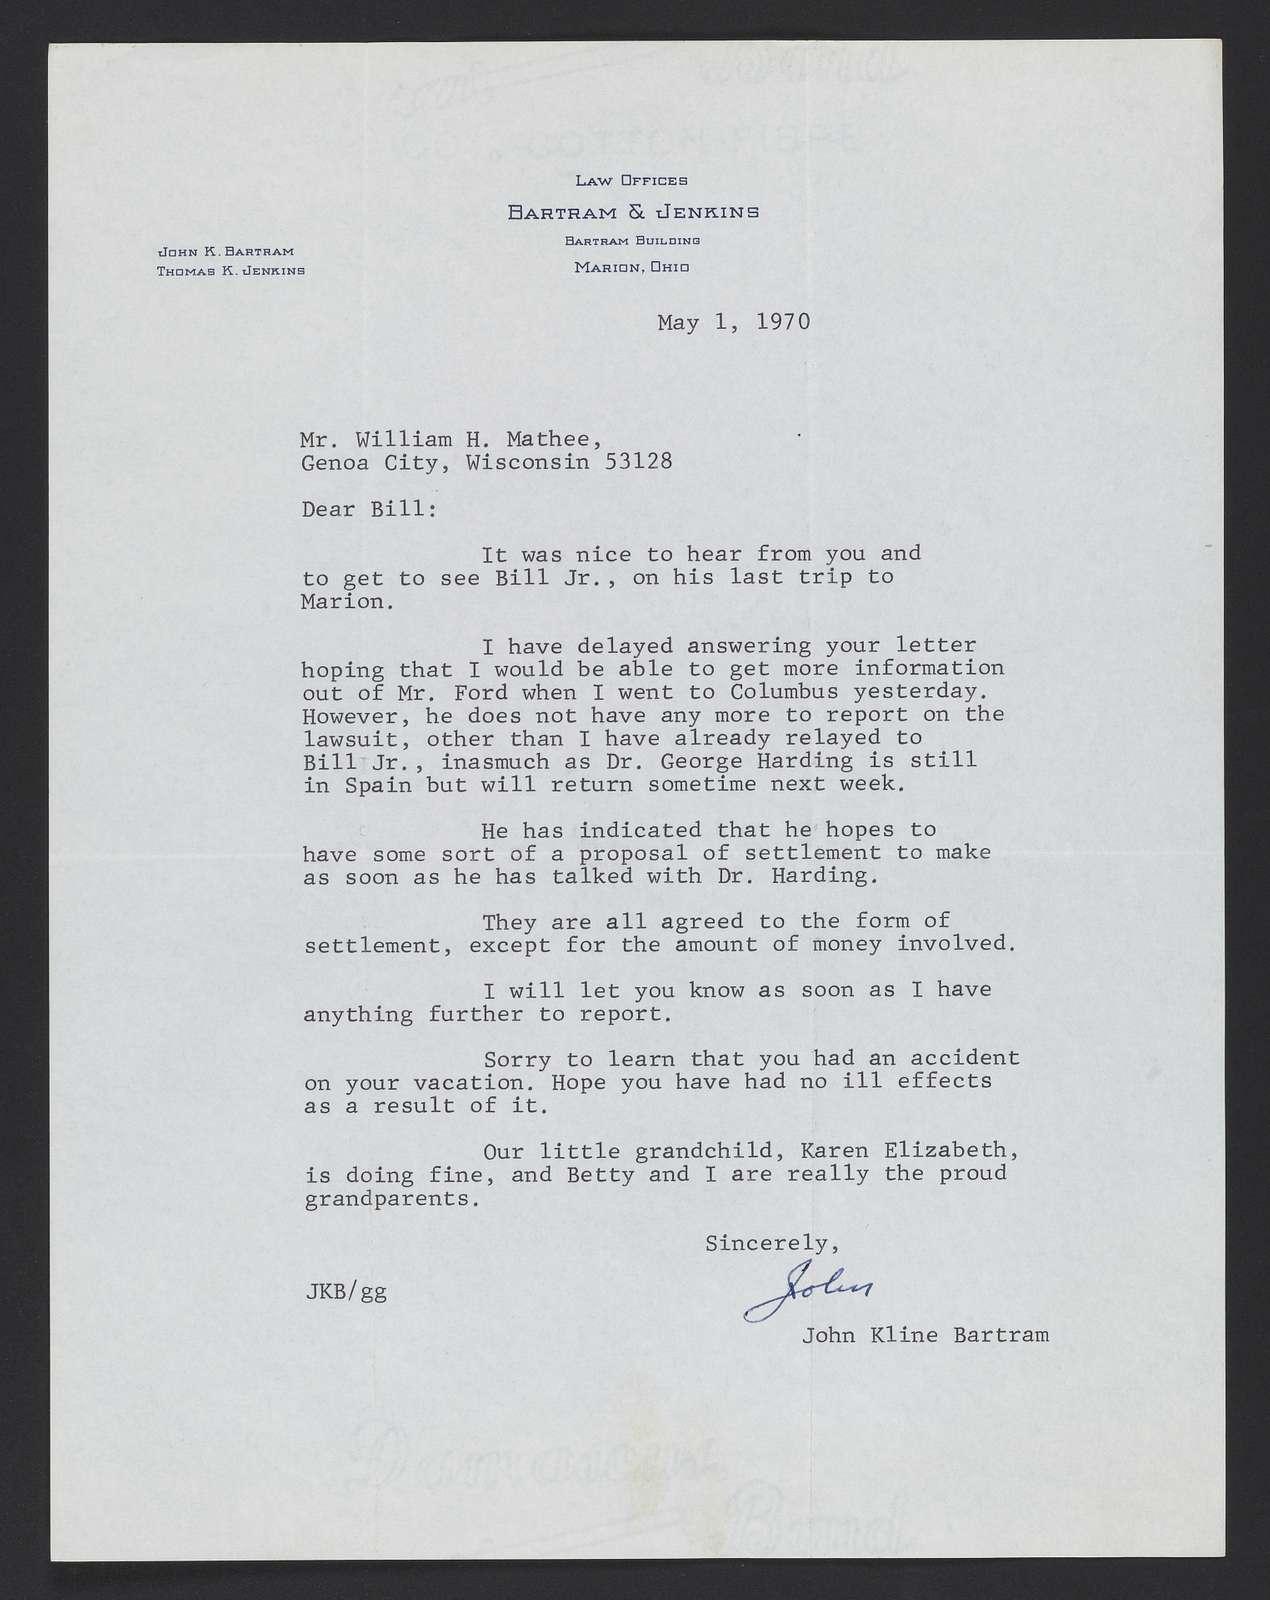 Phillips / Mathée Collection: Legal correspondence, 1964-1971